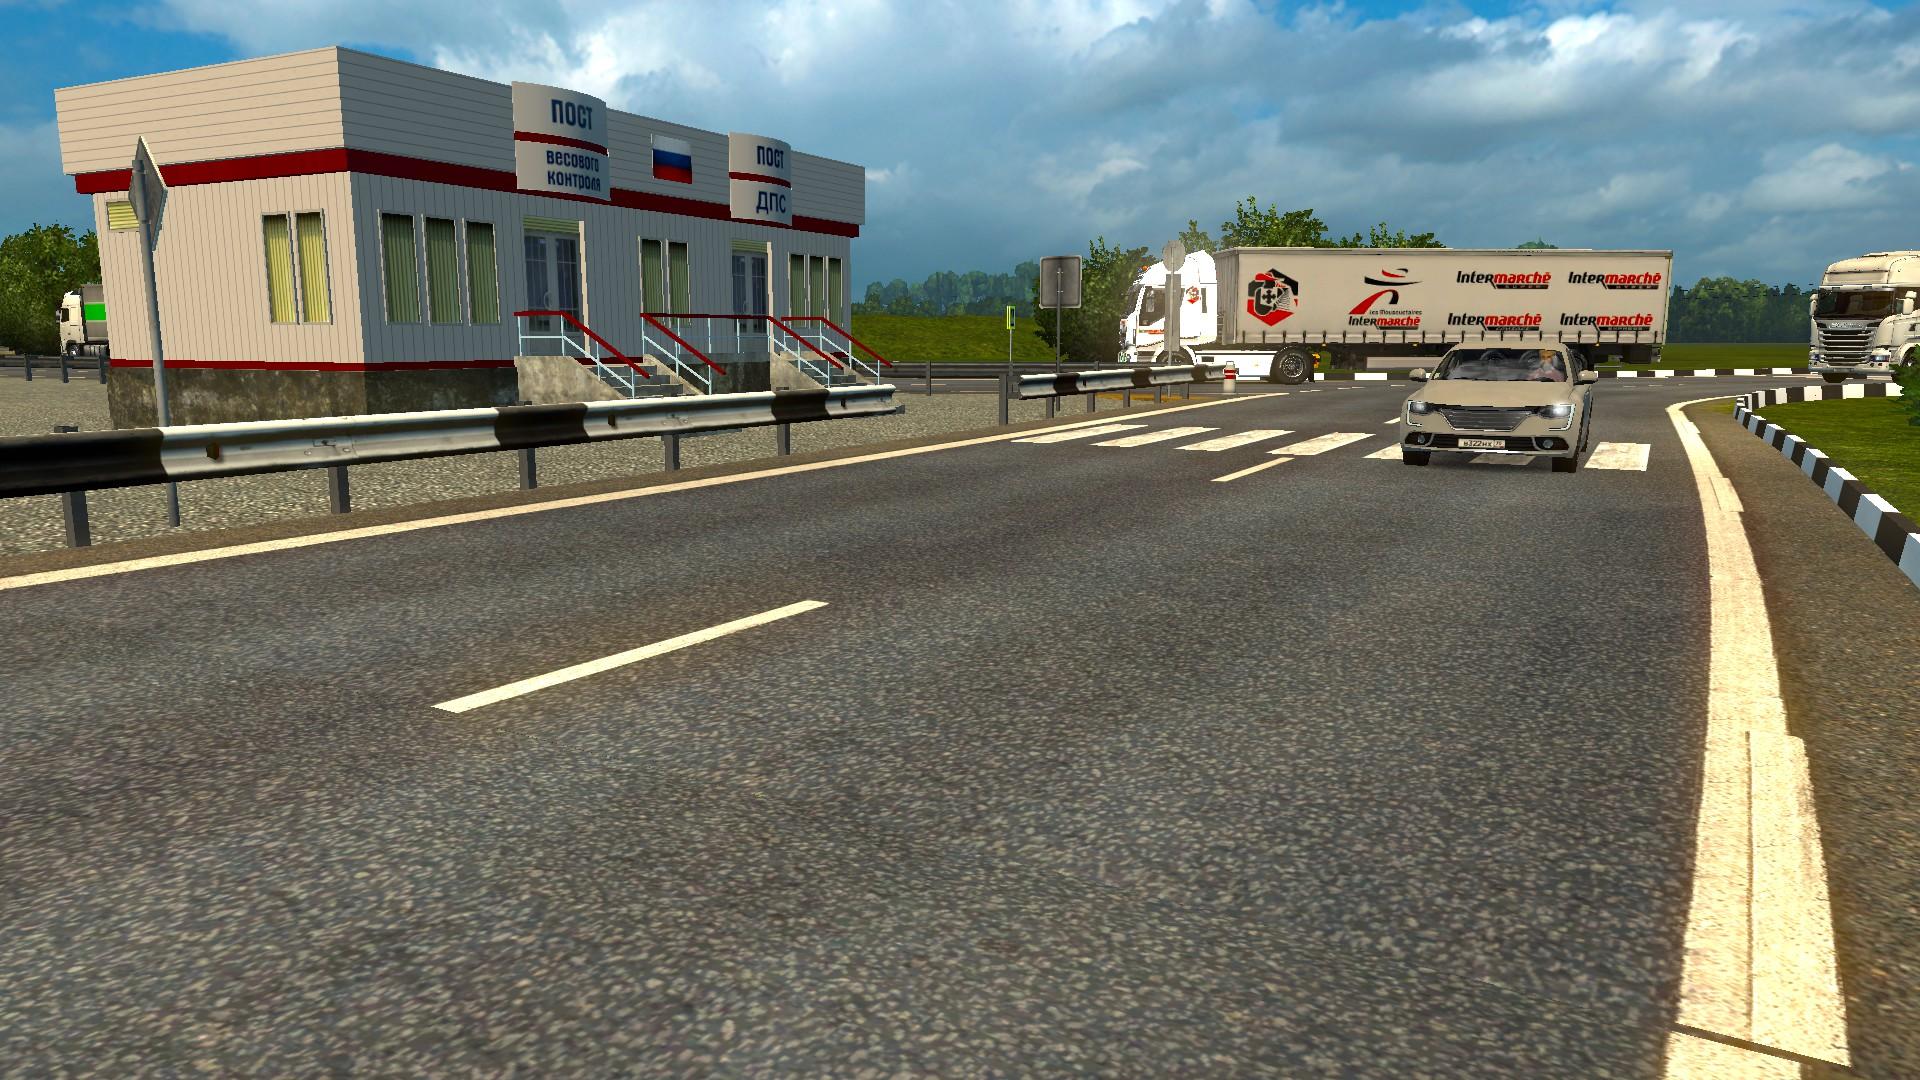 20180604072118_1.jpg - Euro Truck Simulator 2